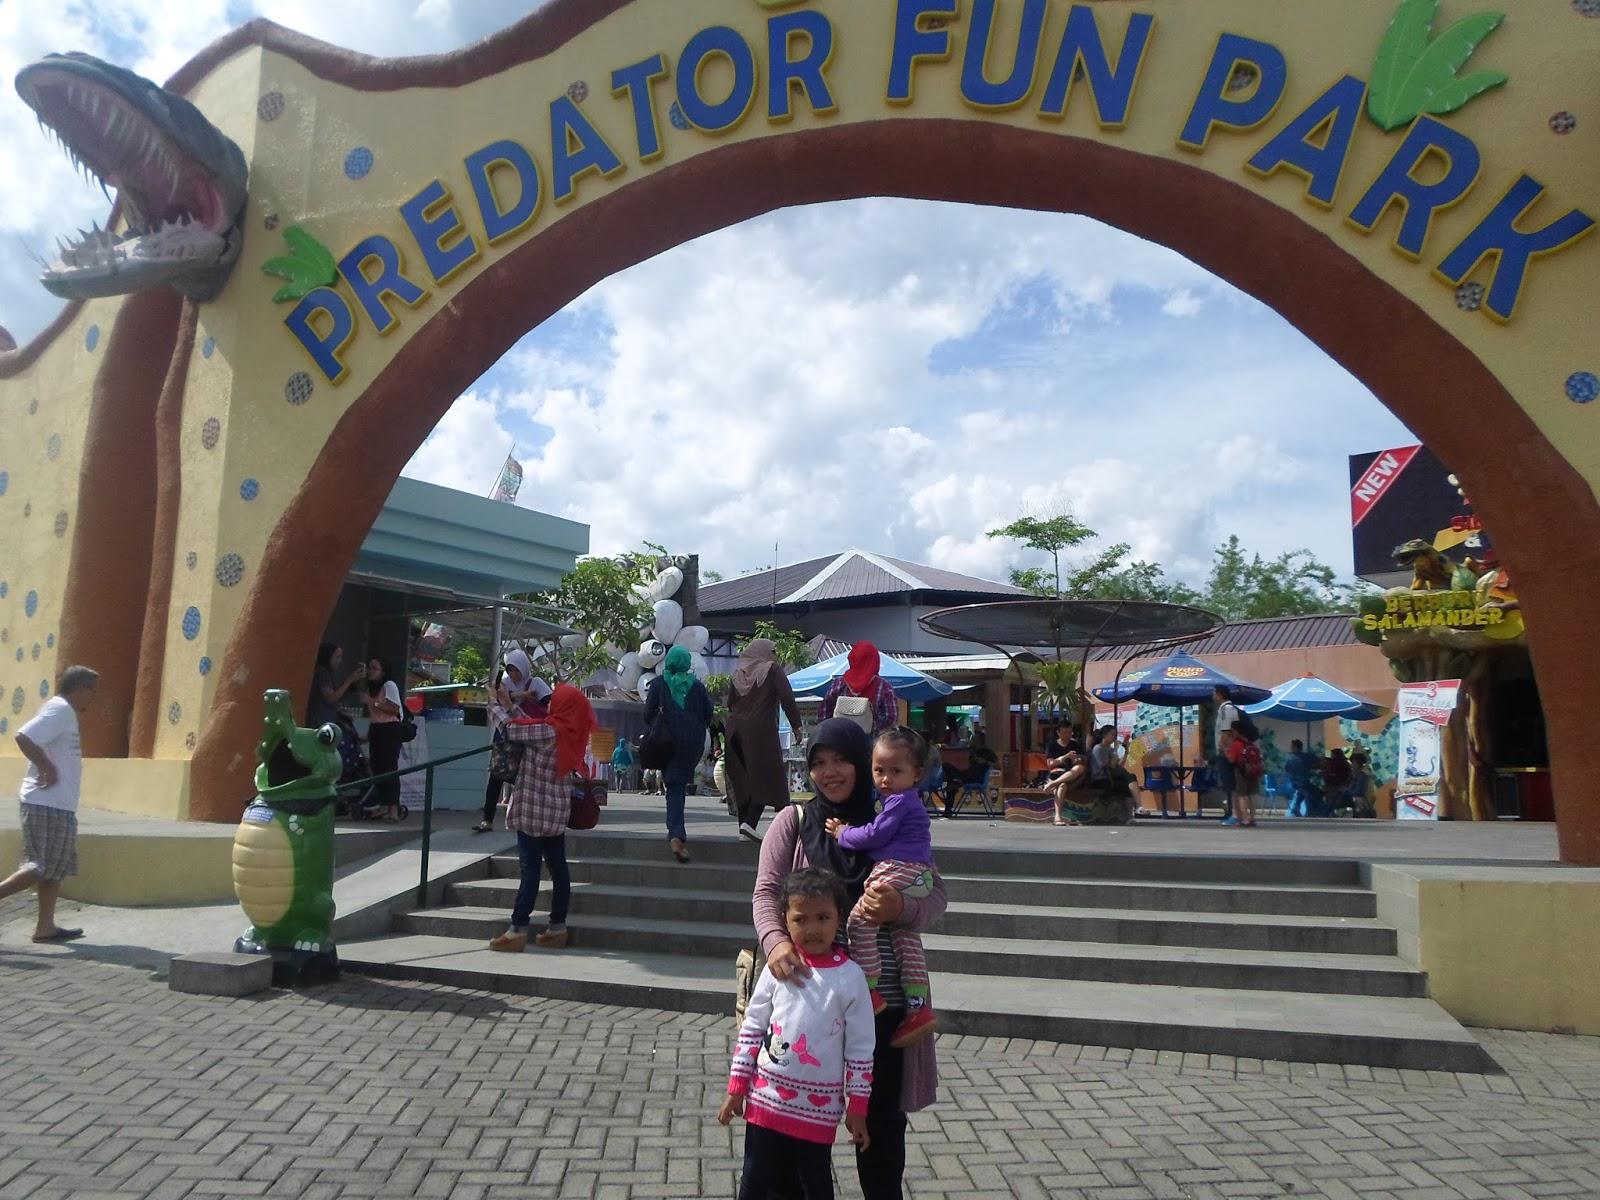 predator-fun-park